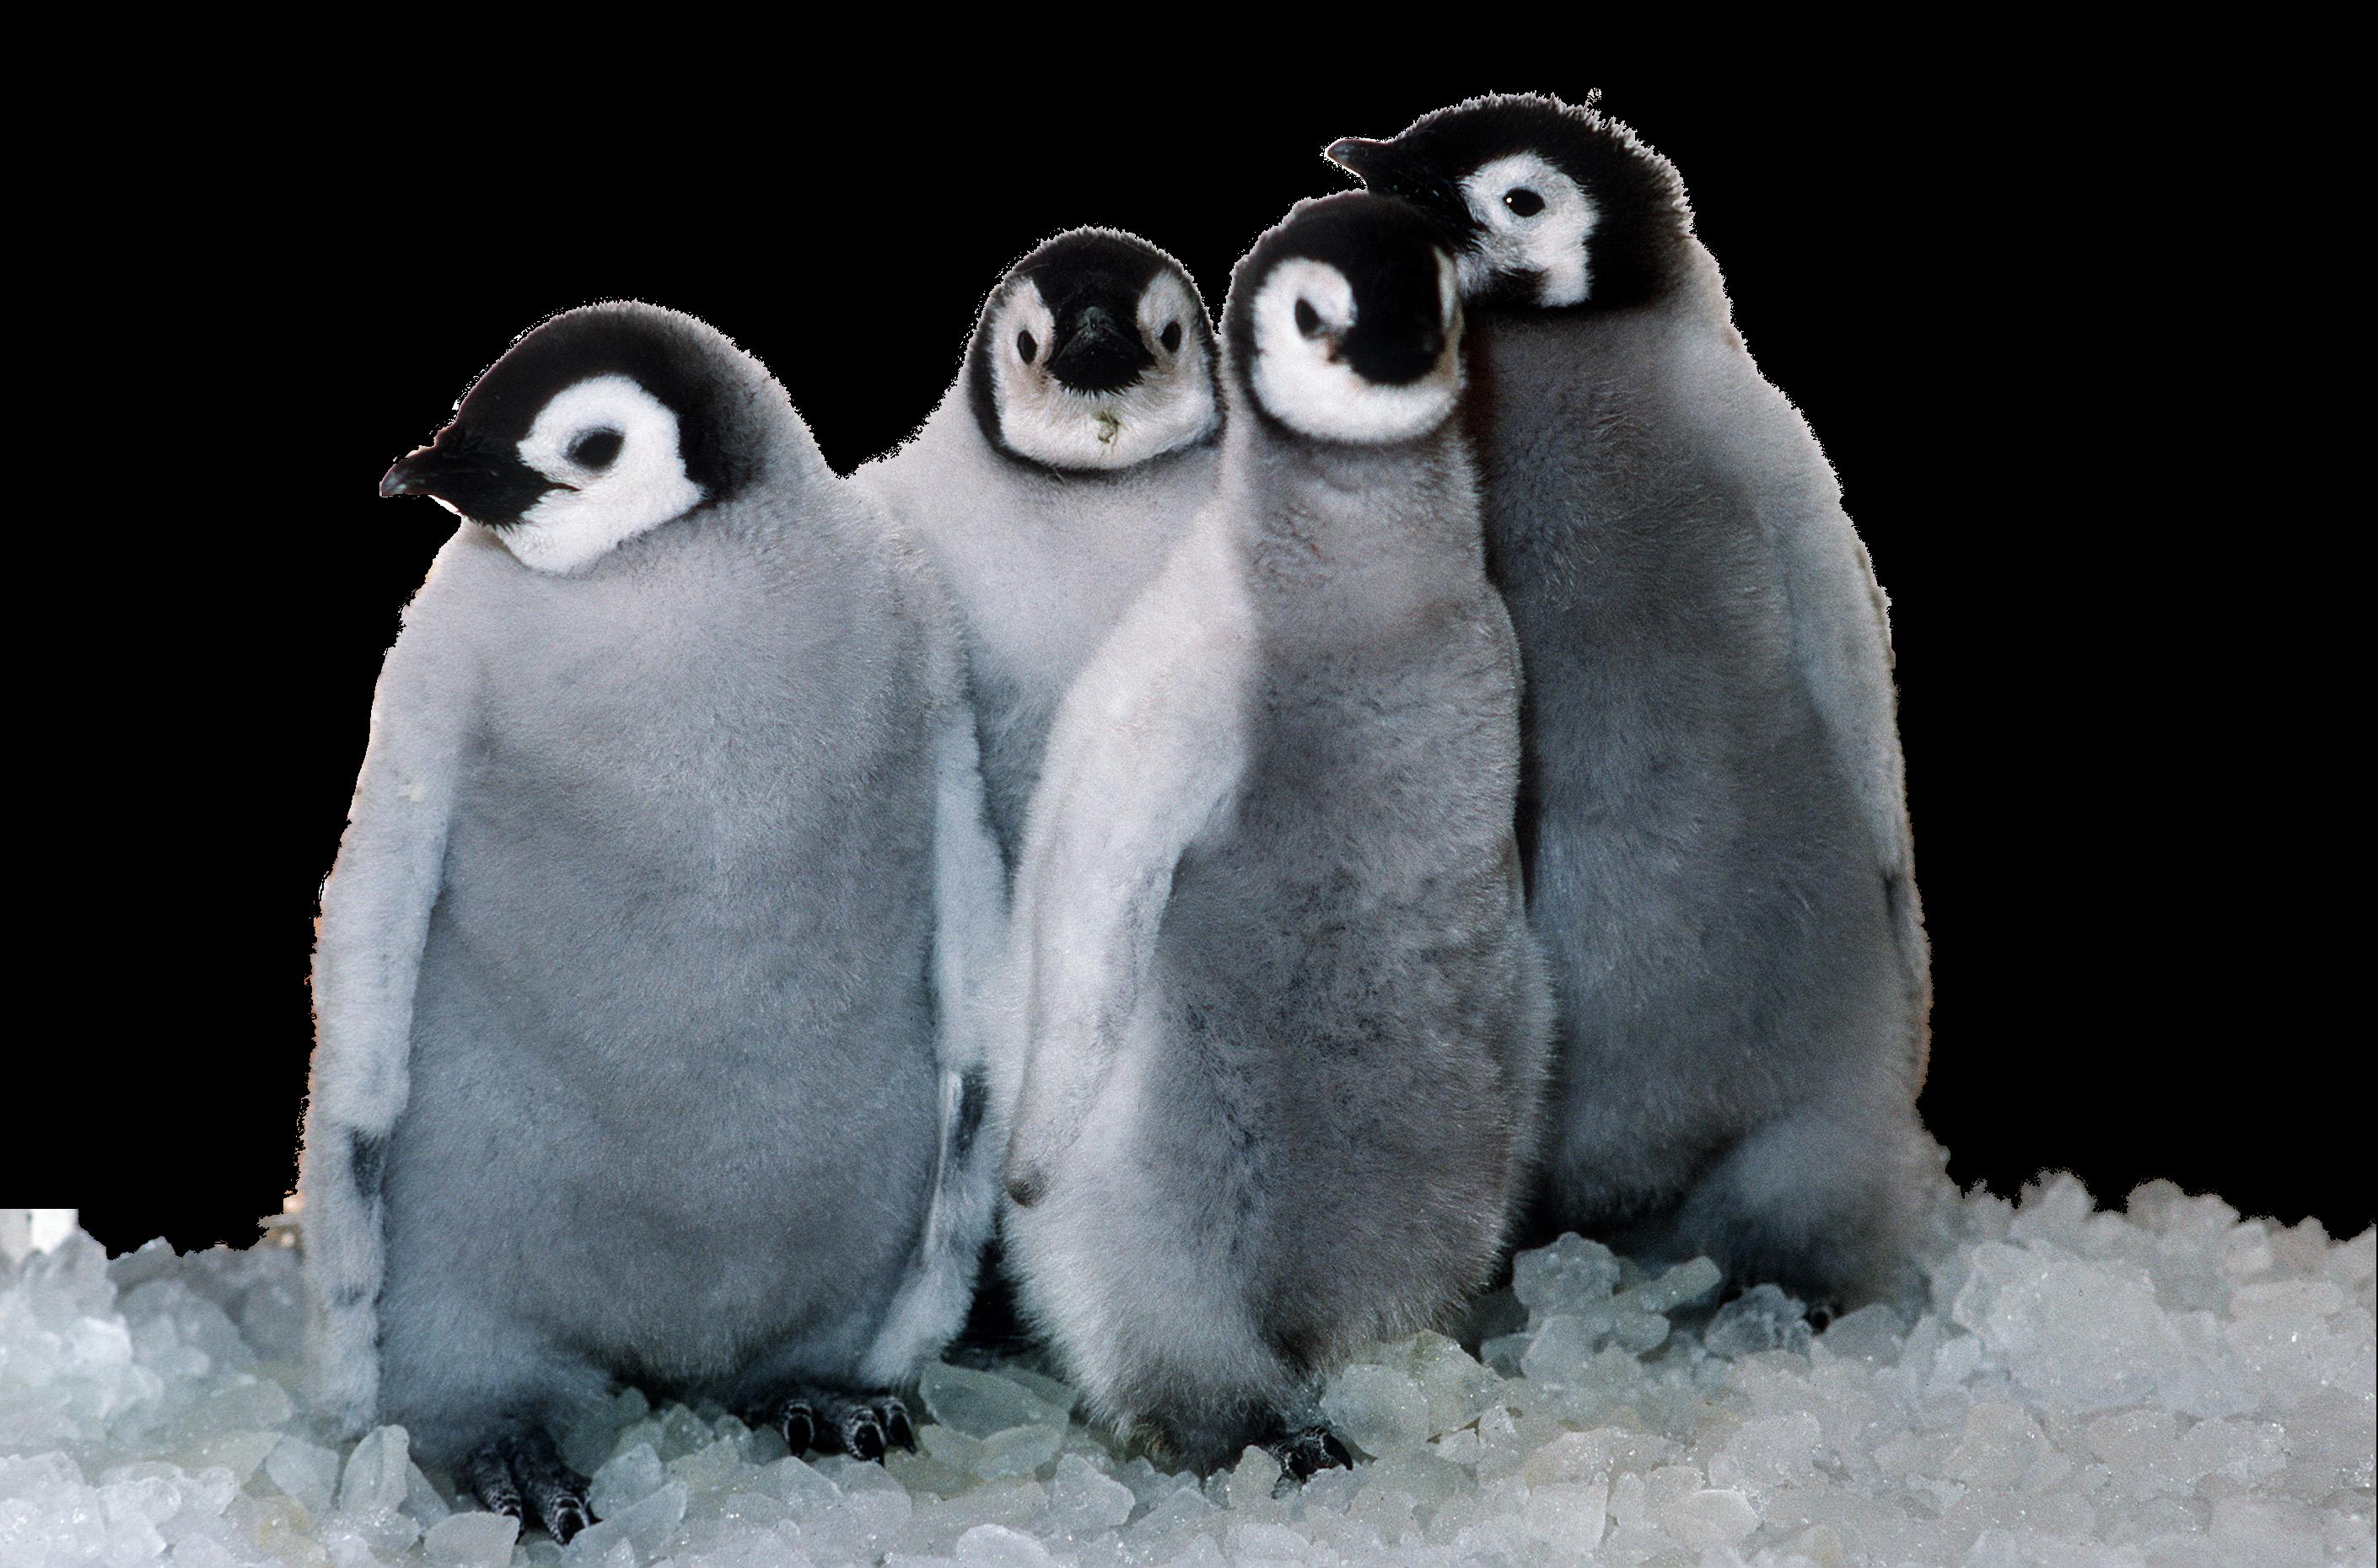 Penguin Png Image #19545 - Penguin, Transparent background PNG HD thumbnail